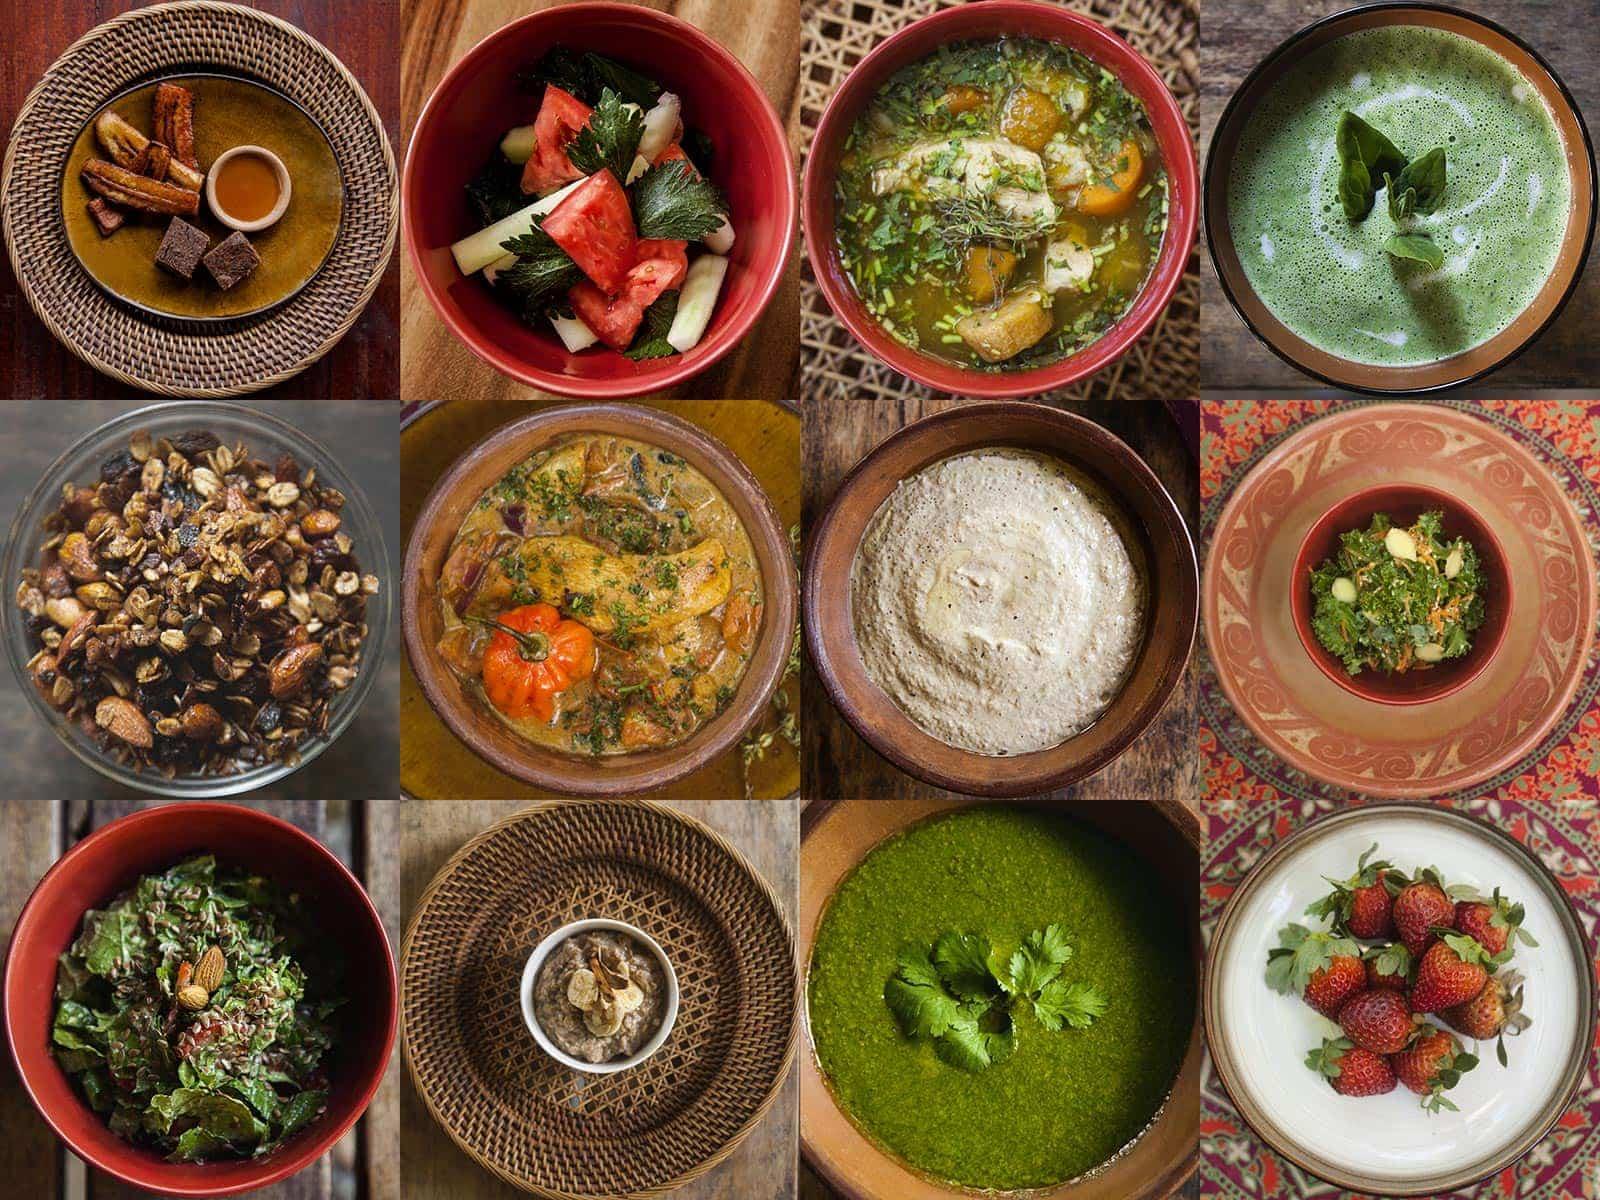 Gourmet Food - 12 Plates